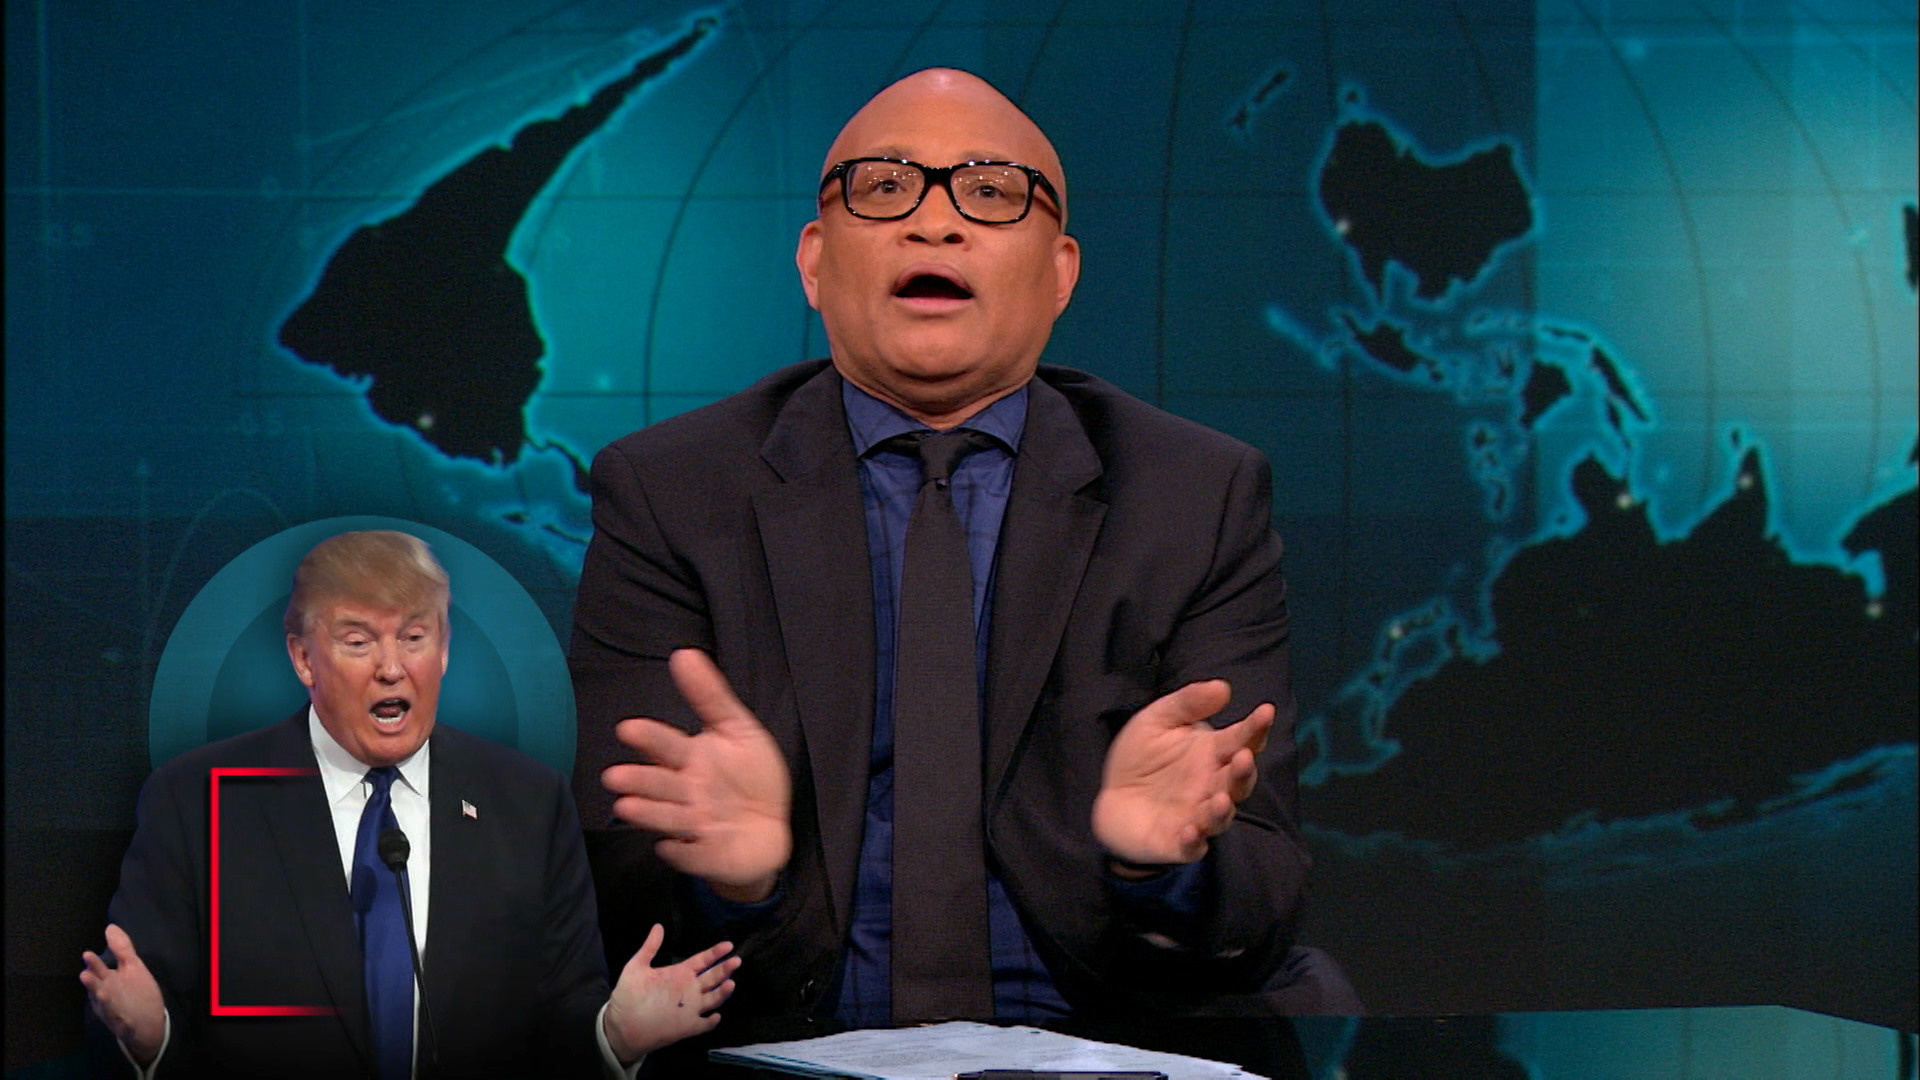 February 8, 2016 - GOP Debate & Beyonce Halftime Show